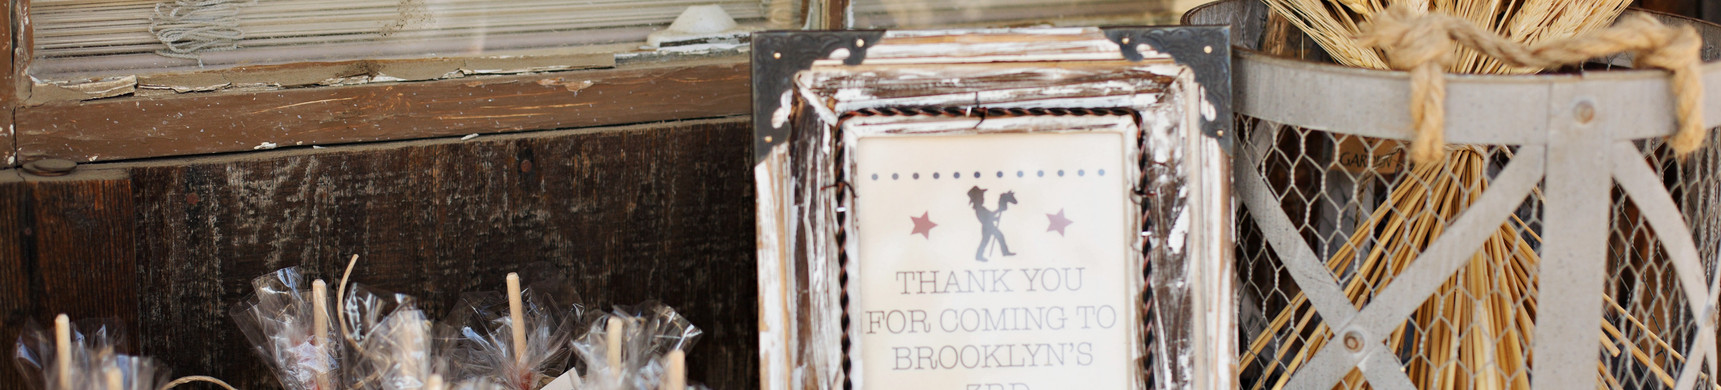 Brooklyn3rdbaday_0029.jpg